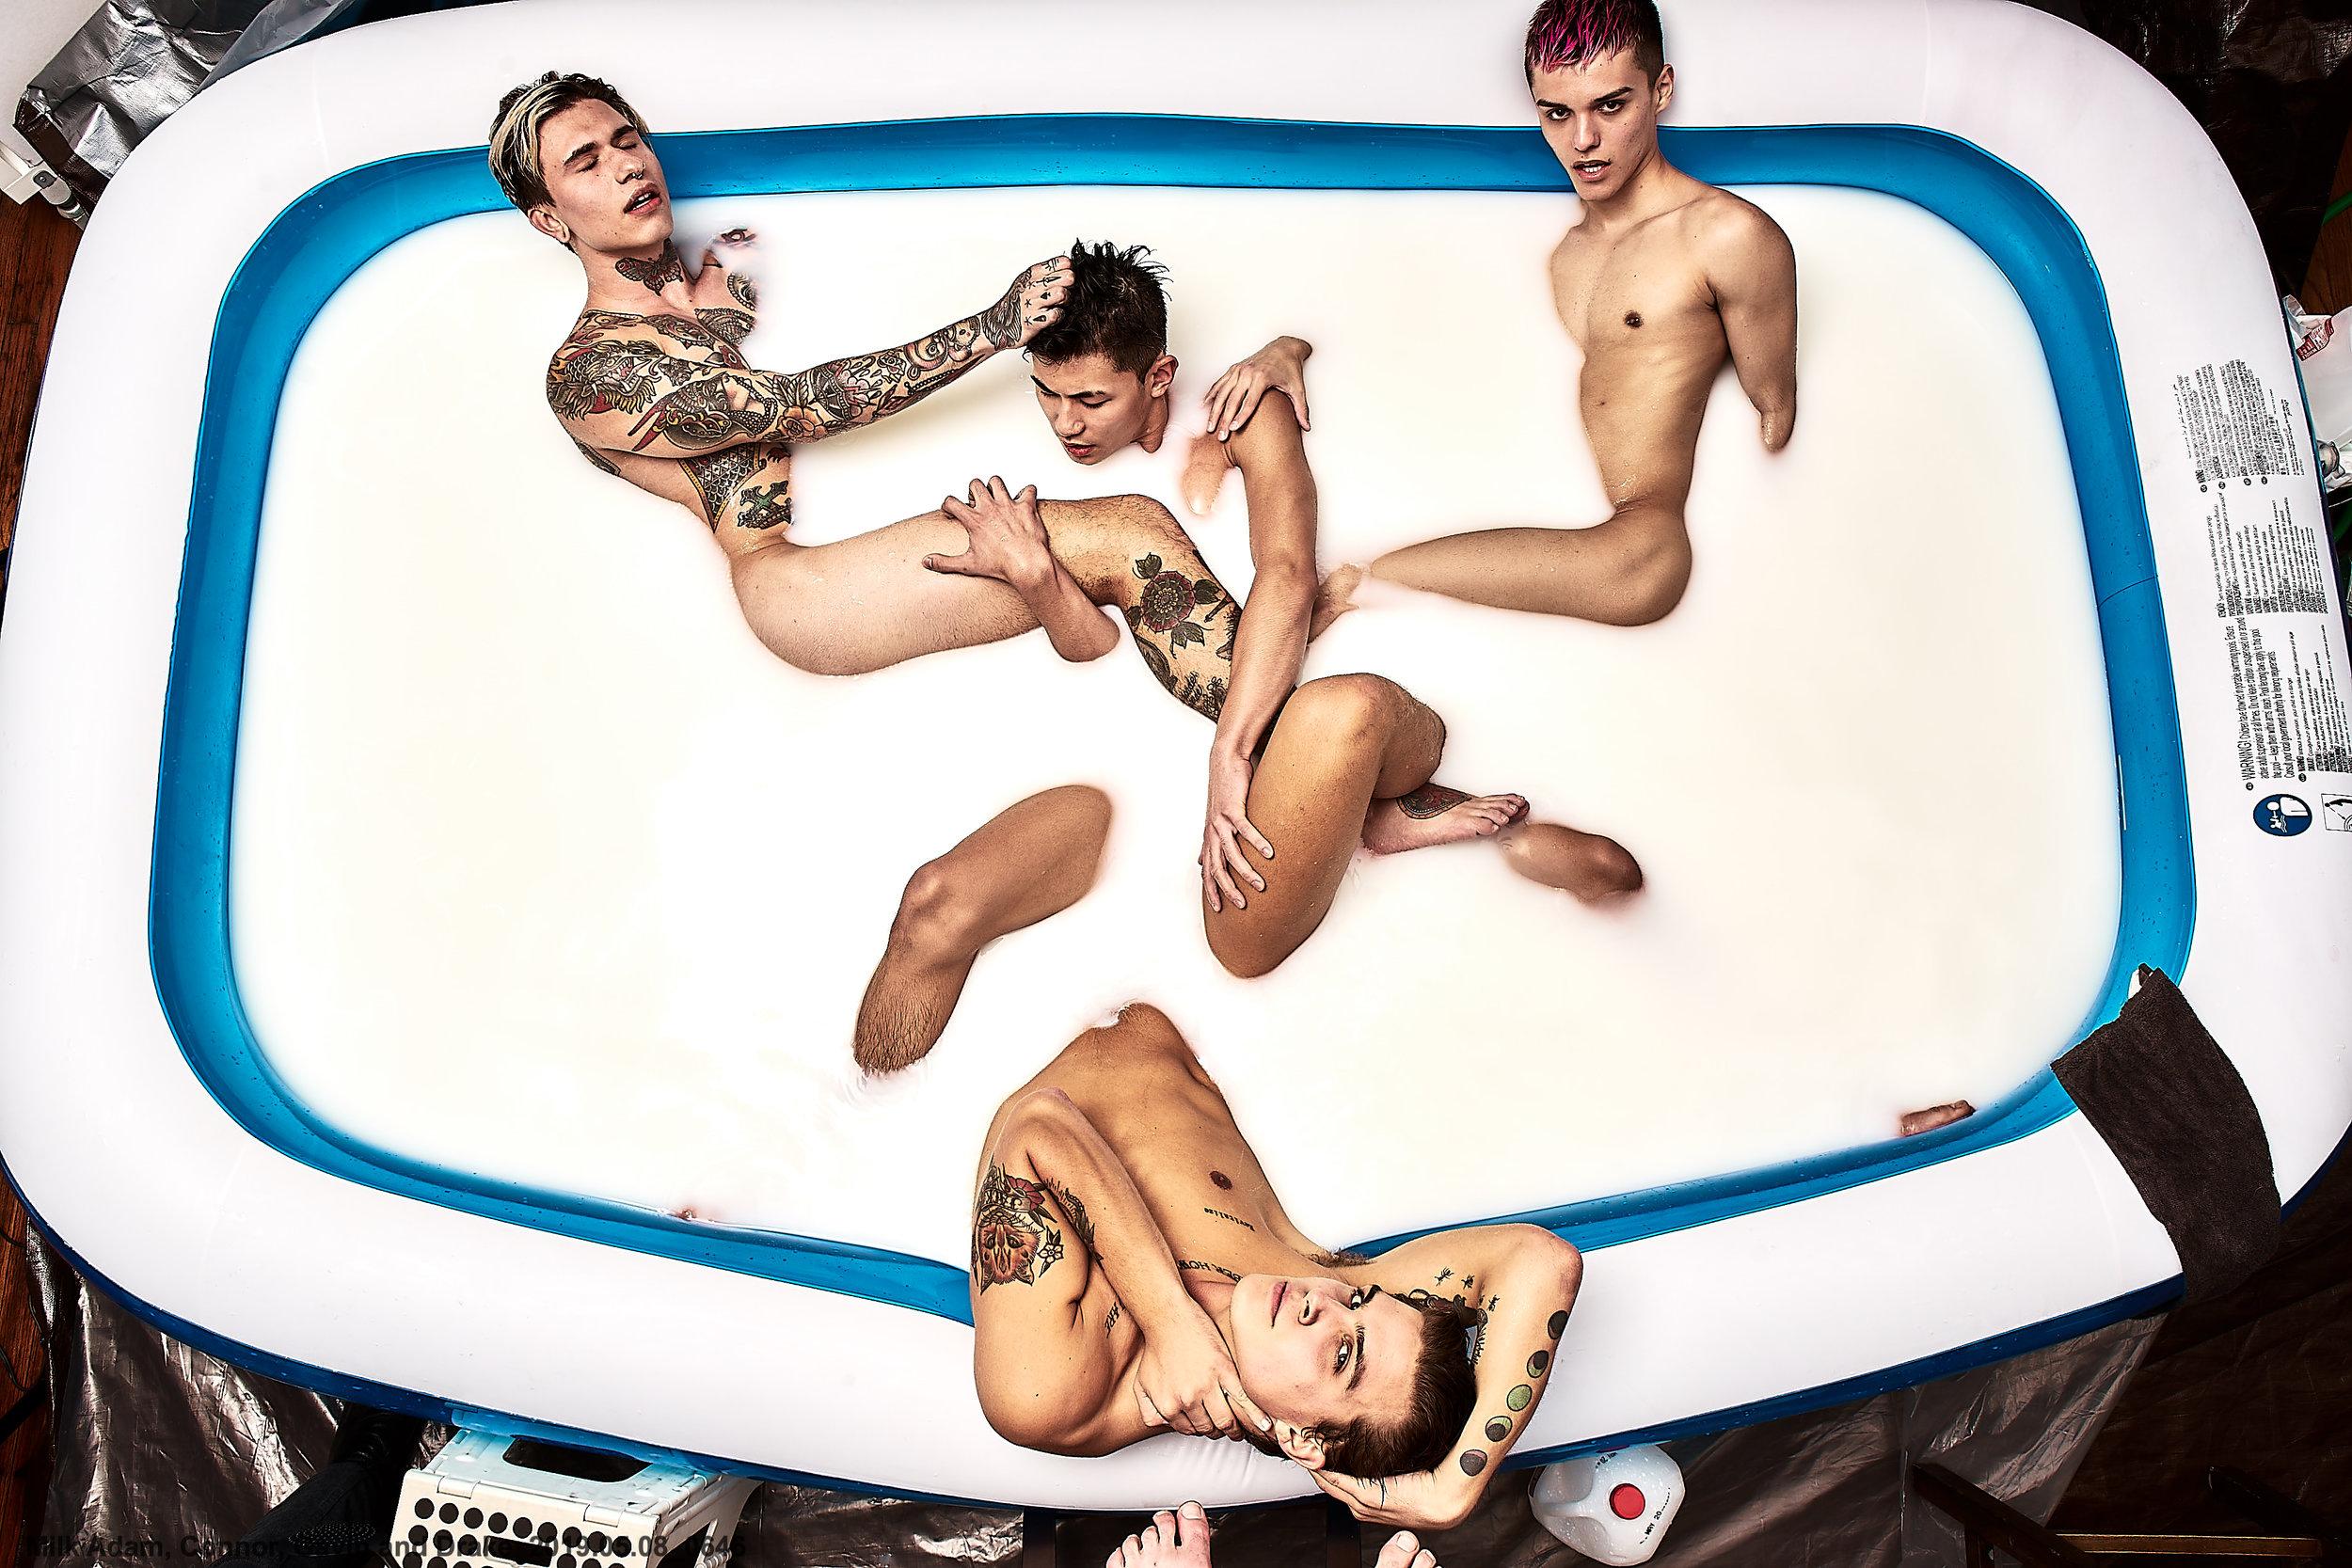 Milk Adam, Connor, Gavin and Drake_2019.05.08_0646.jpg